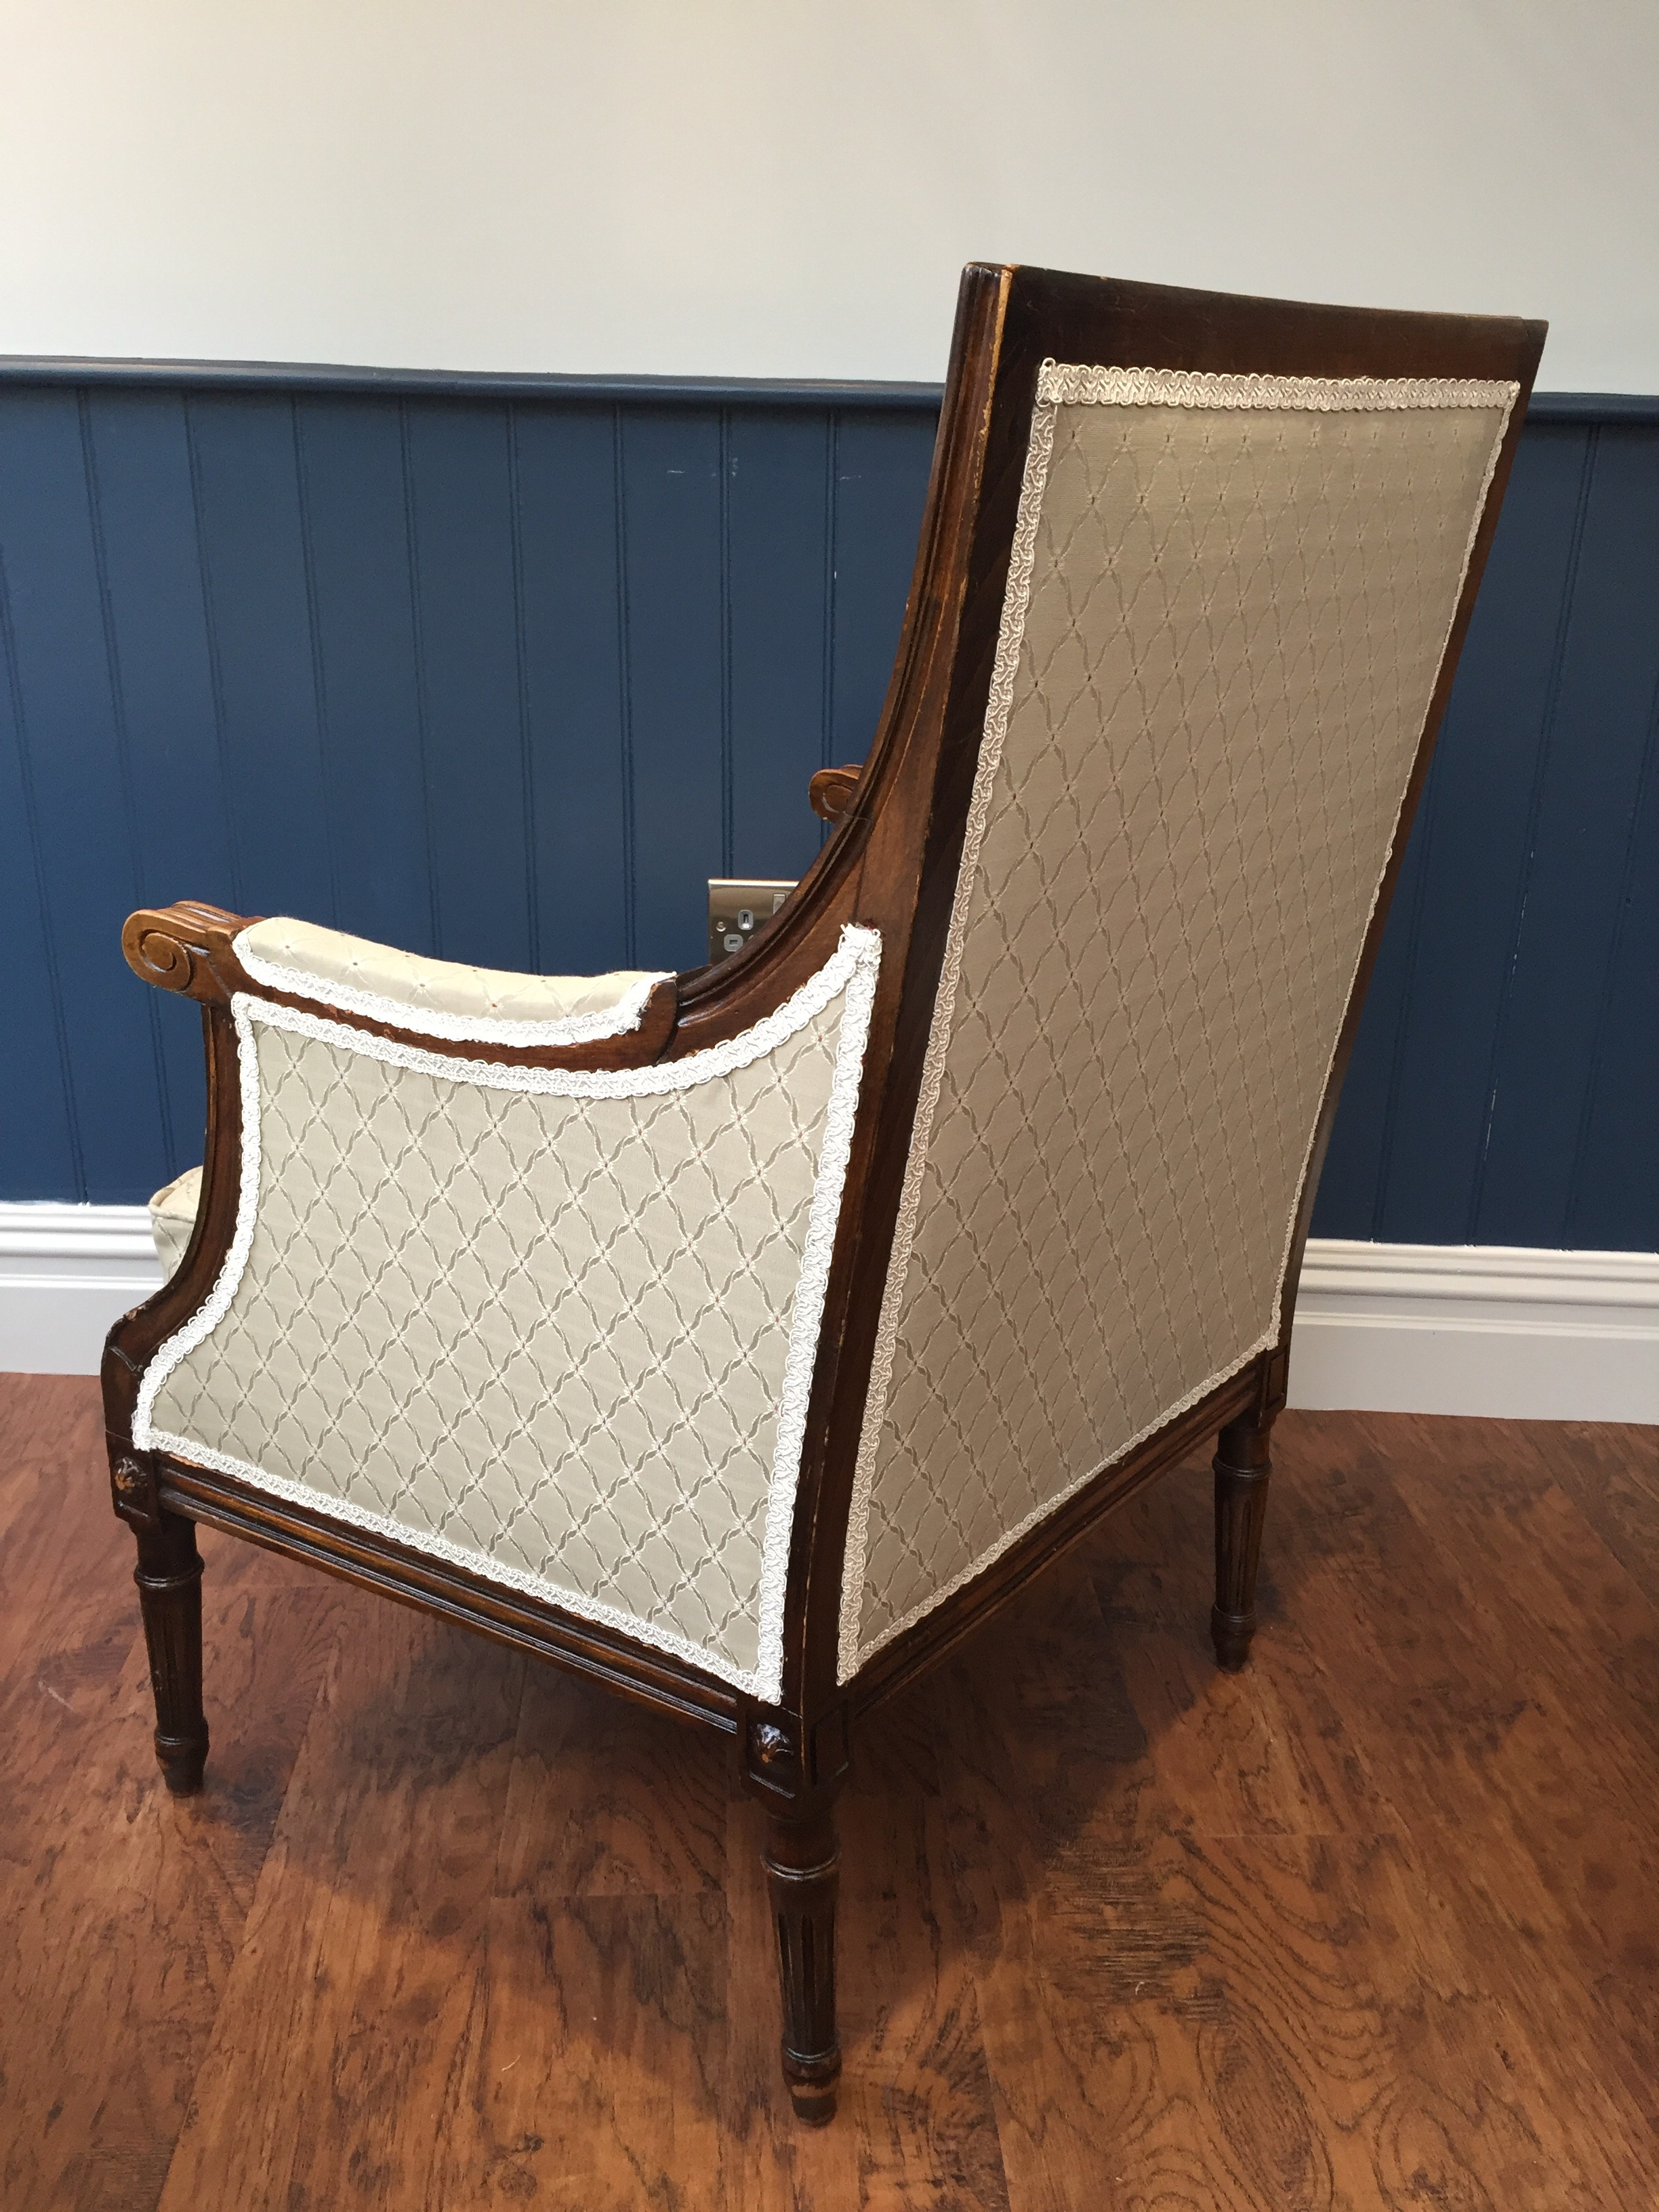 Antique armchair facing backwards